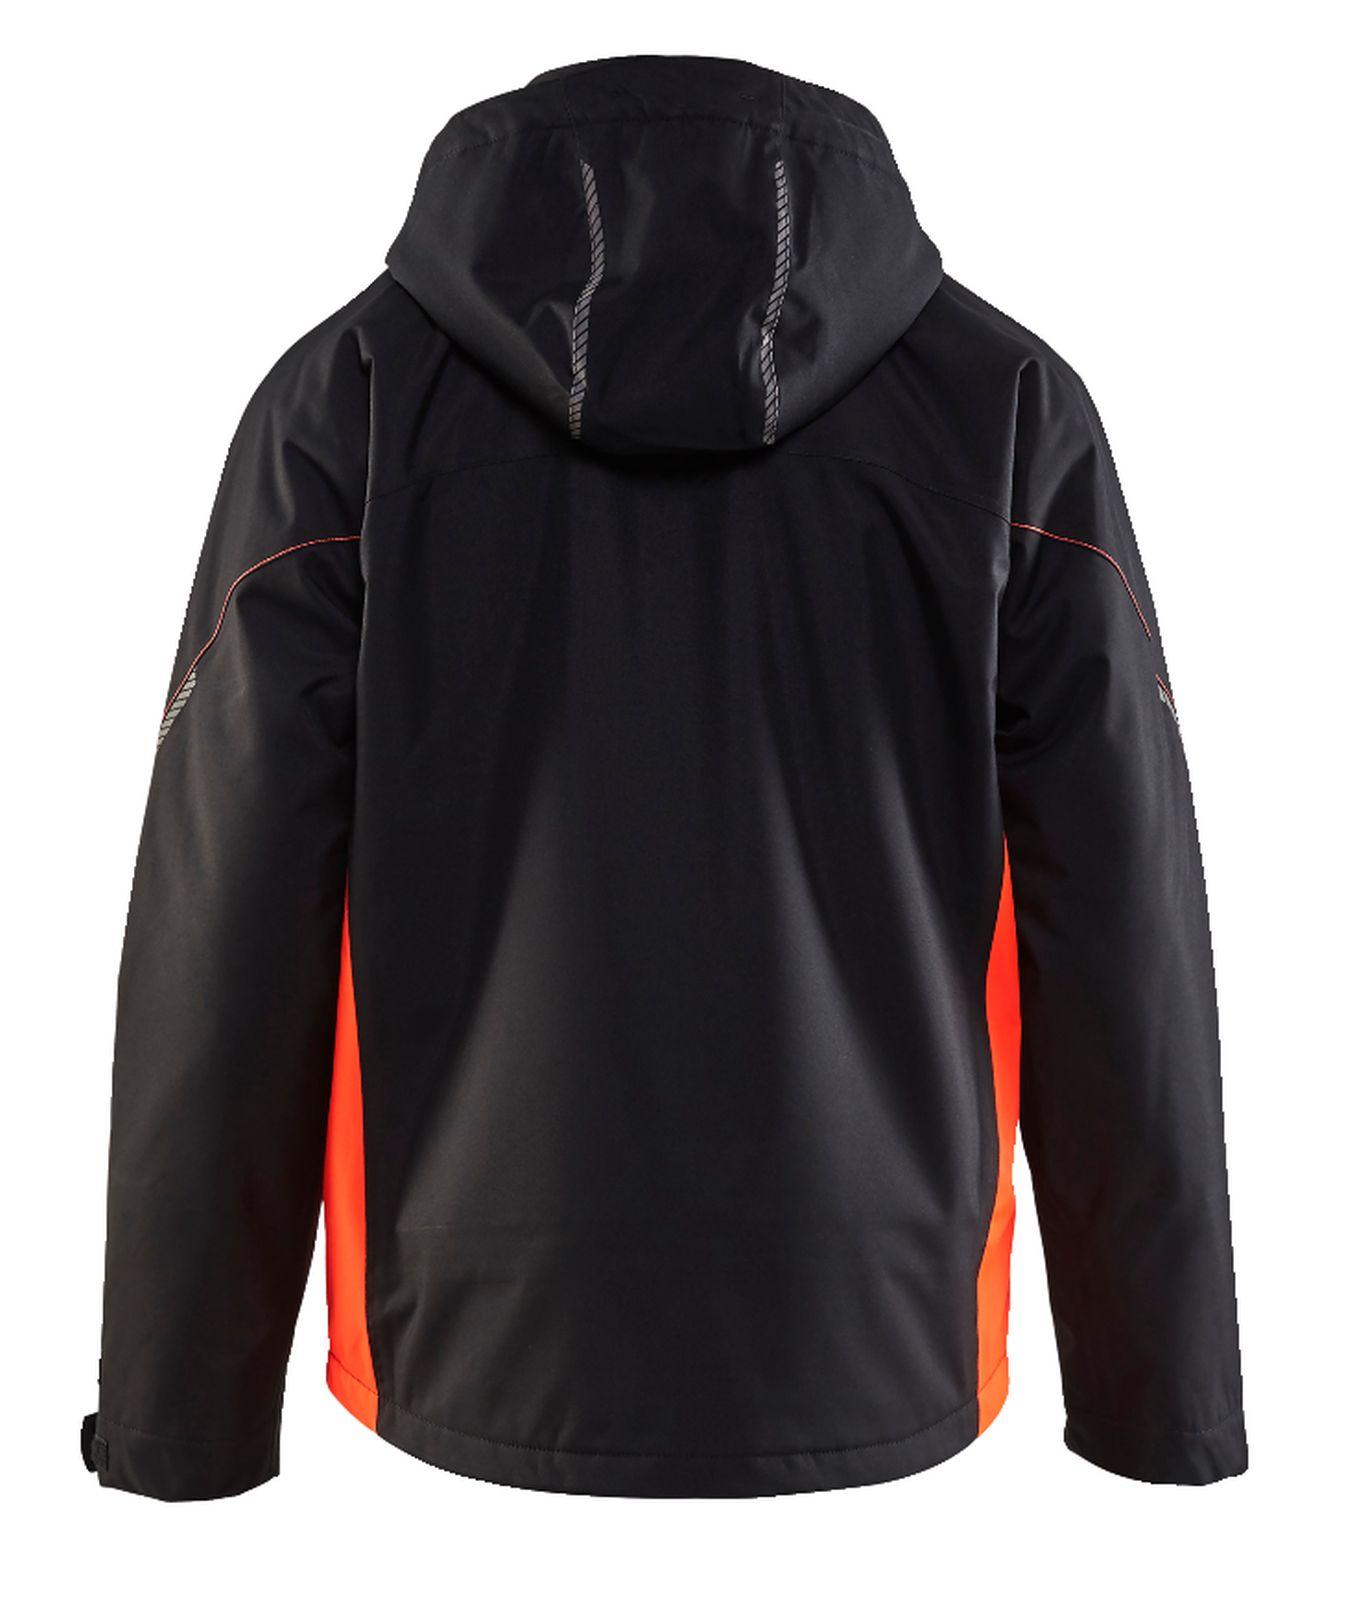 Blaklader Regenjacks 47901977 zwart-fluor rood(9955)